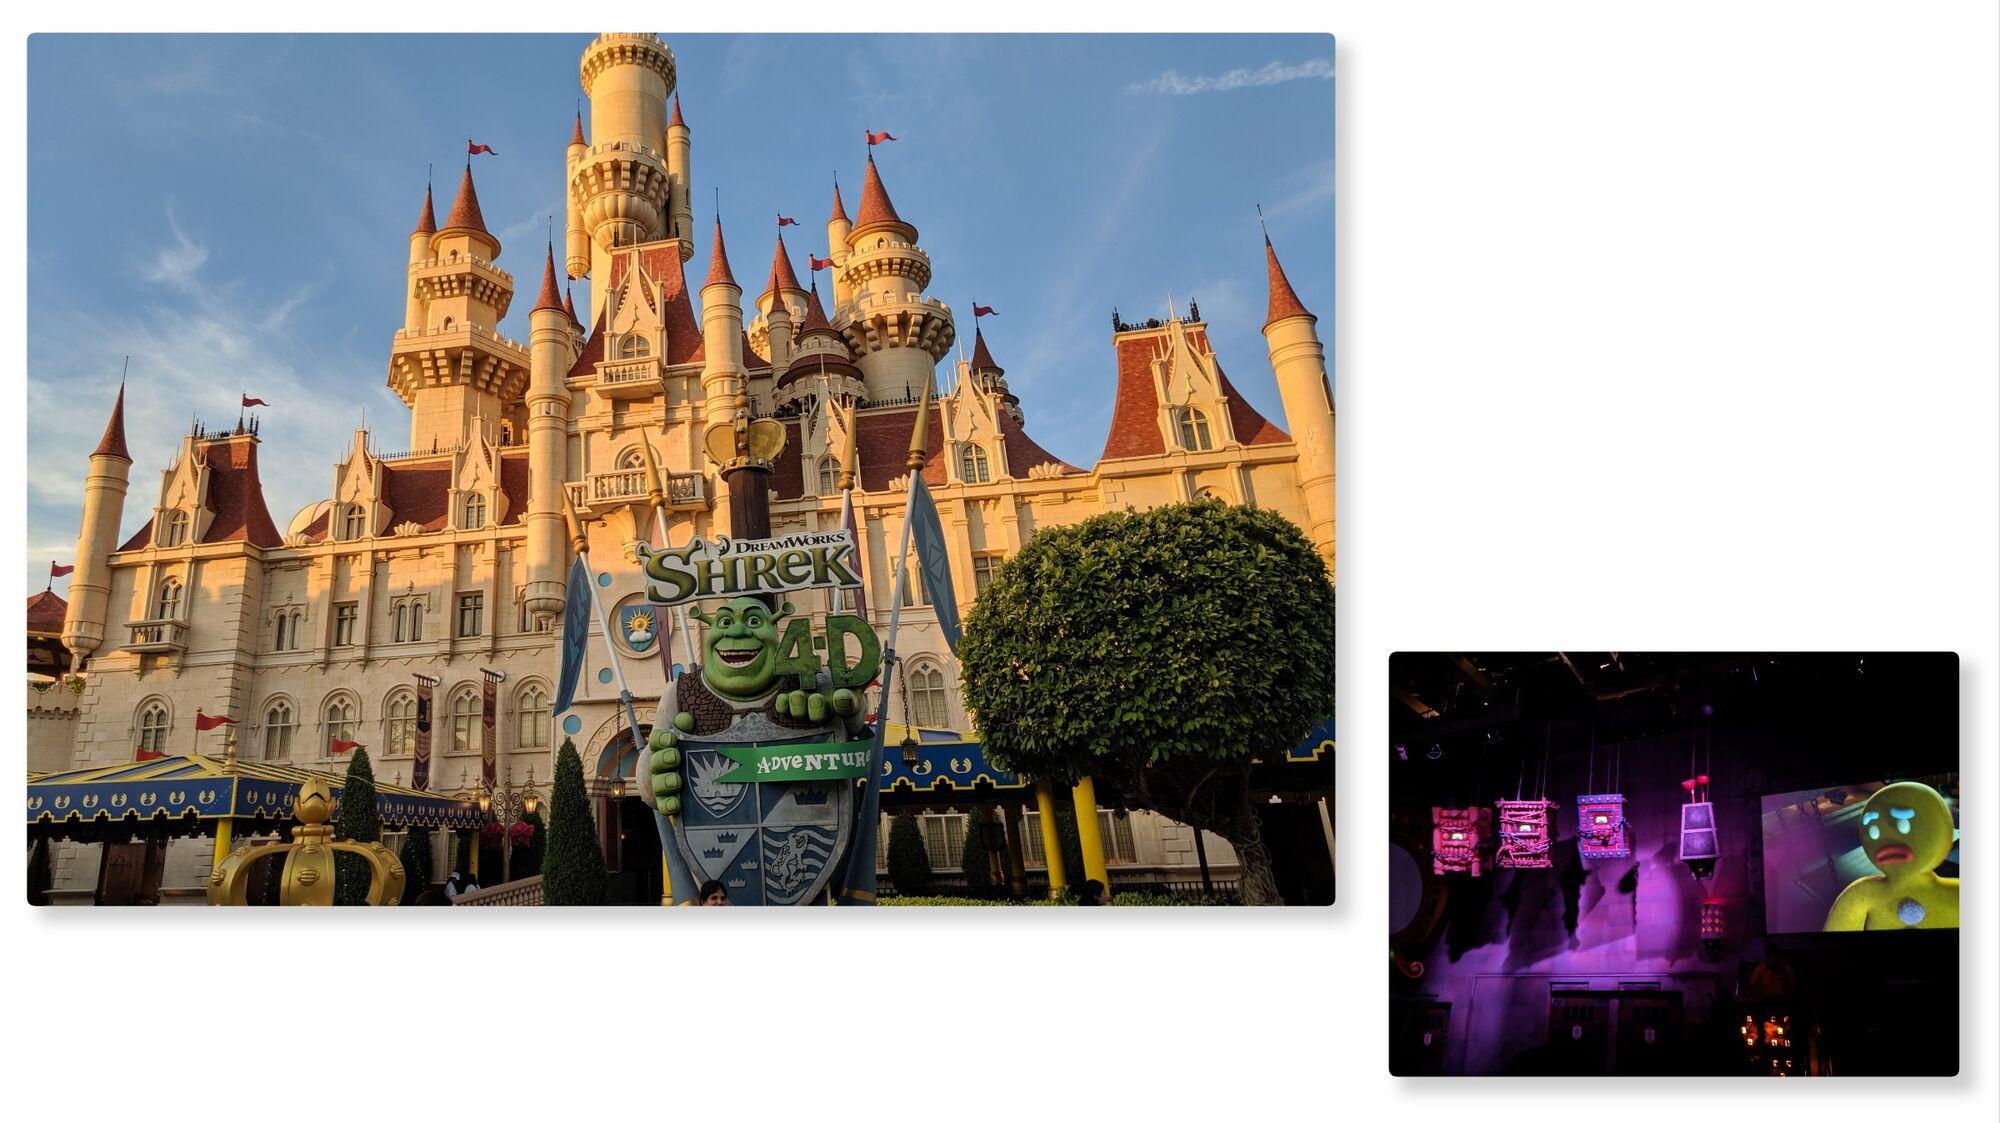 Dreamworks Shrek castle and show